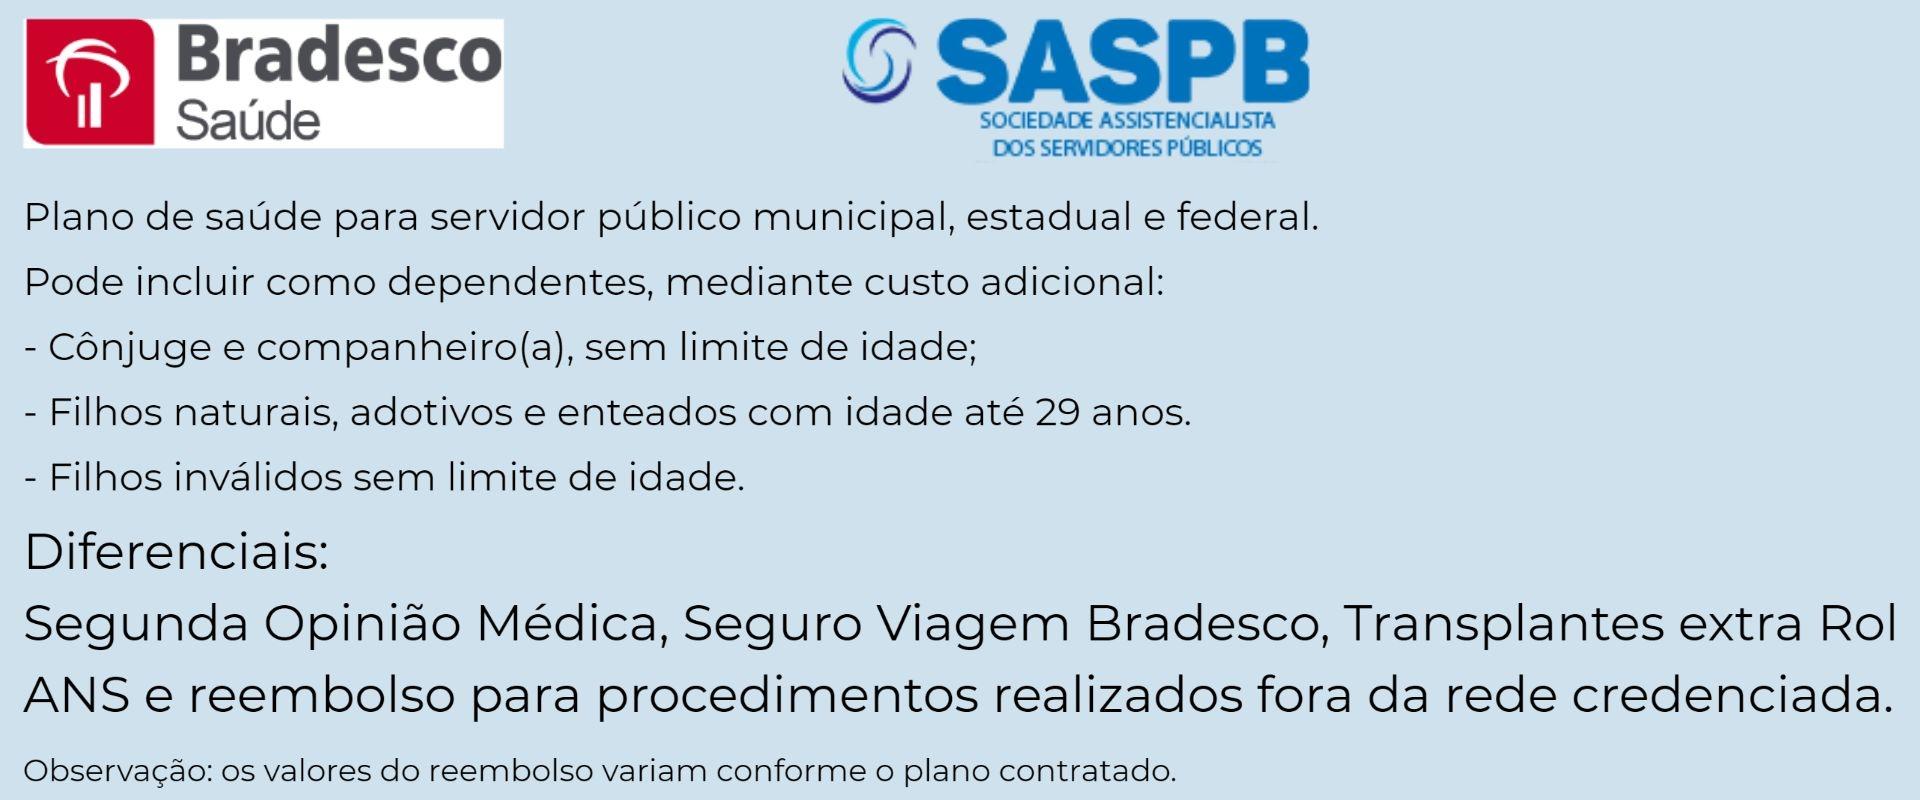 Bradesco Saúde SASPB-DF